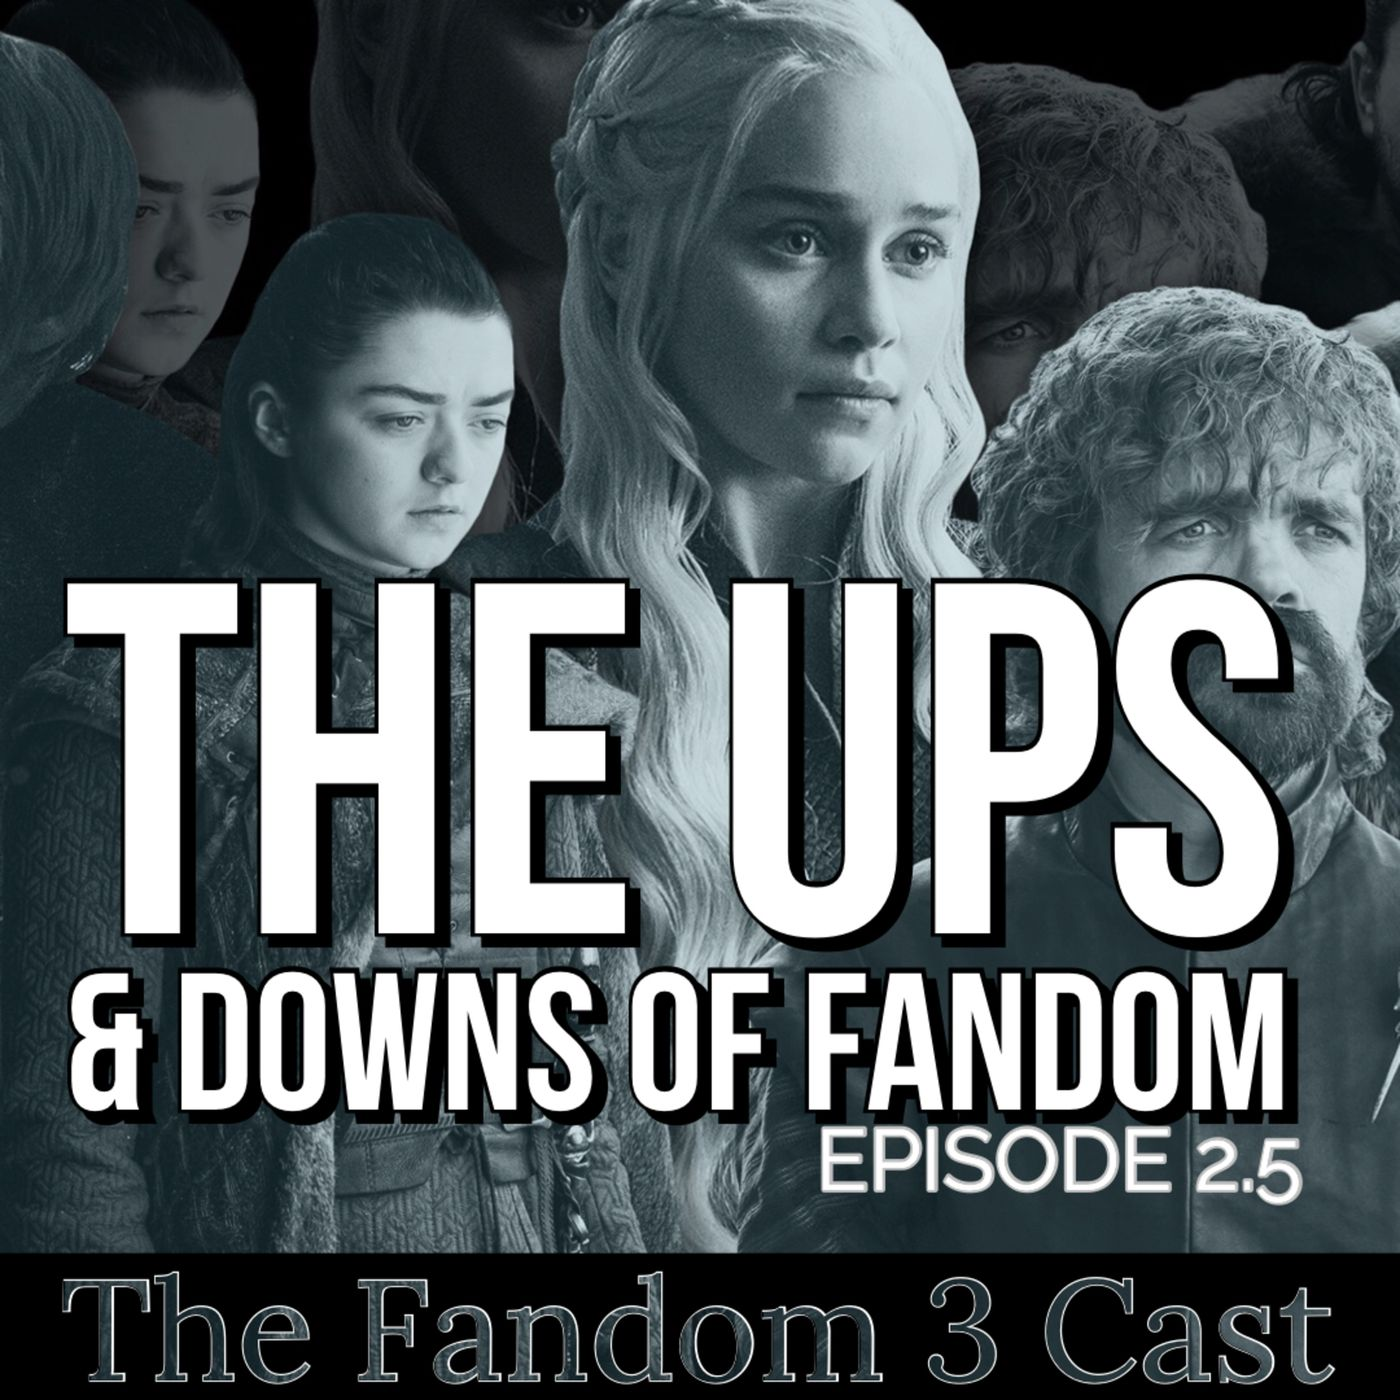 How Fandom Works & The Ups & Downs Of Fandom